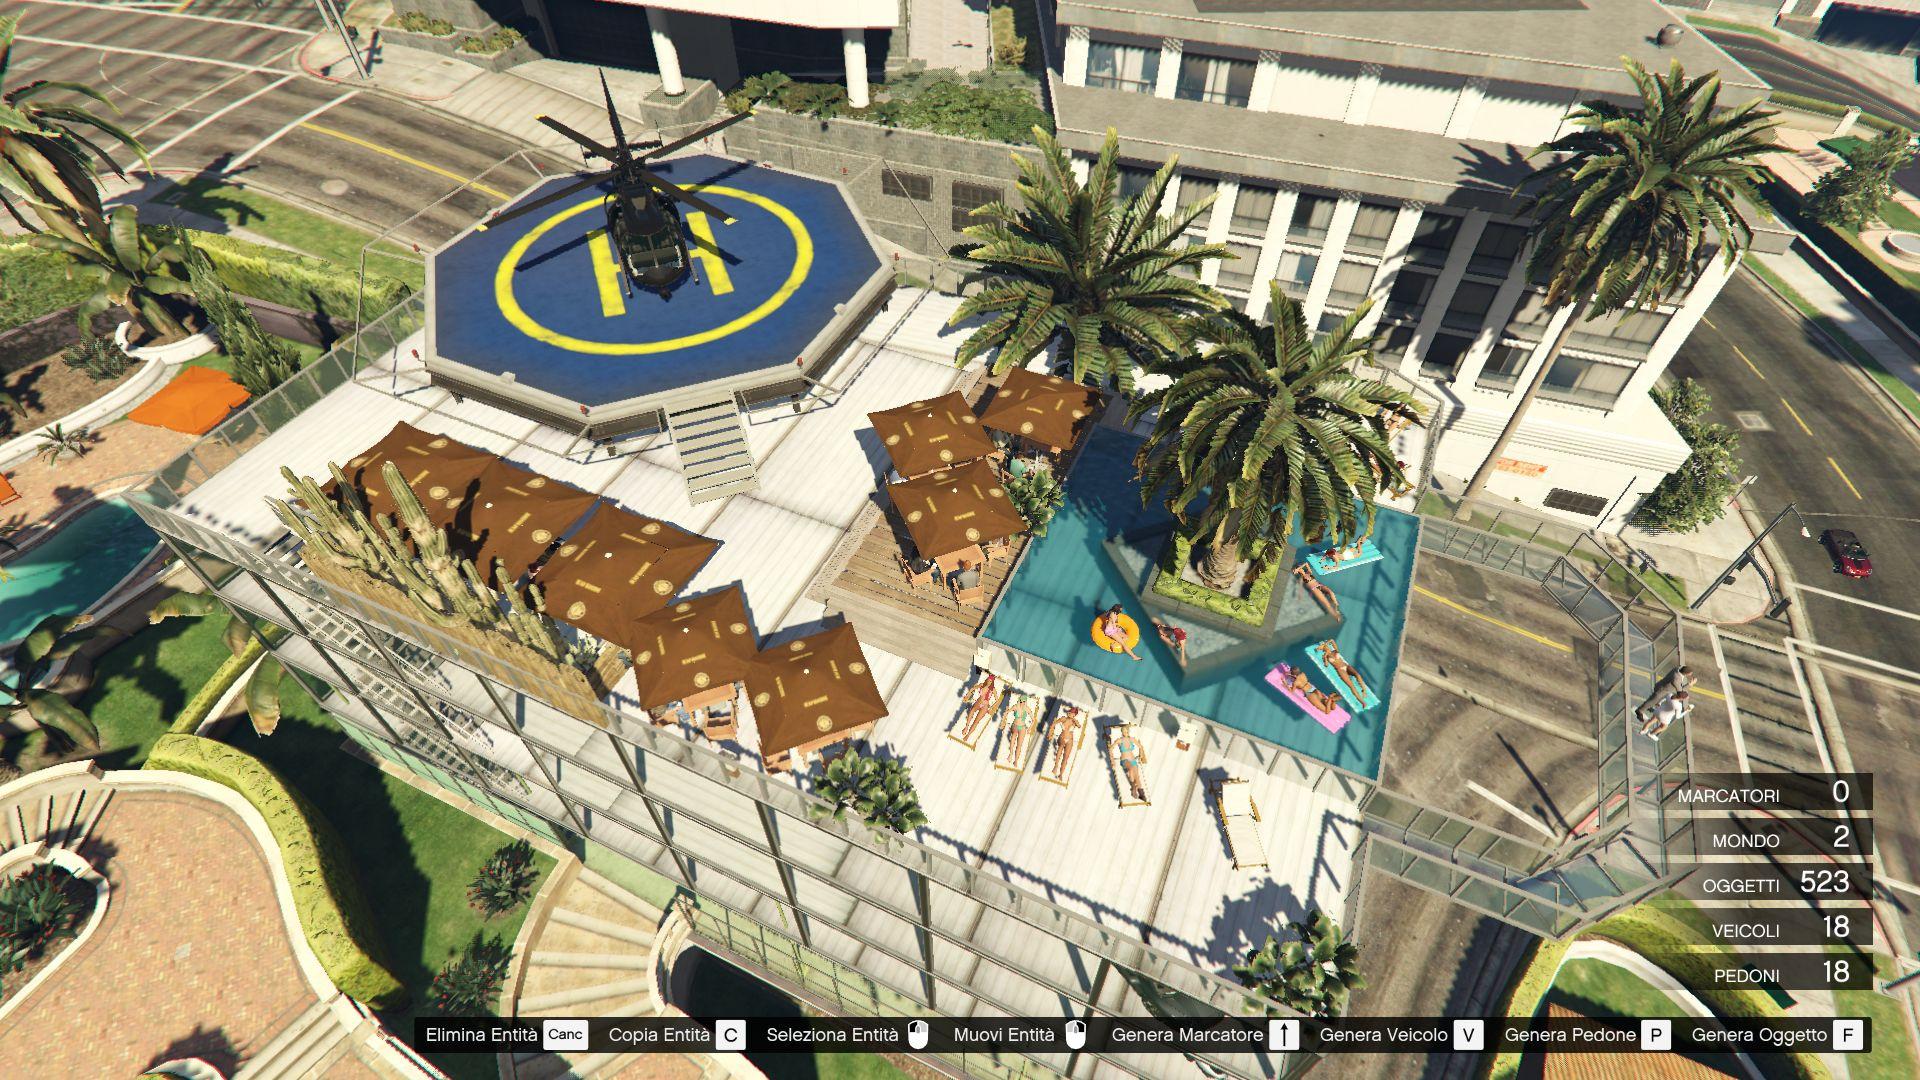 Michael's garage 2   party terrace [map editor / spg]   gta5 mods.com